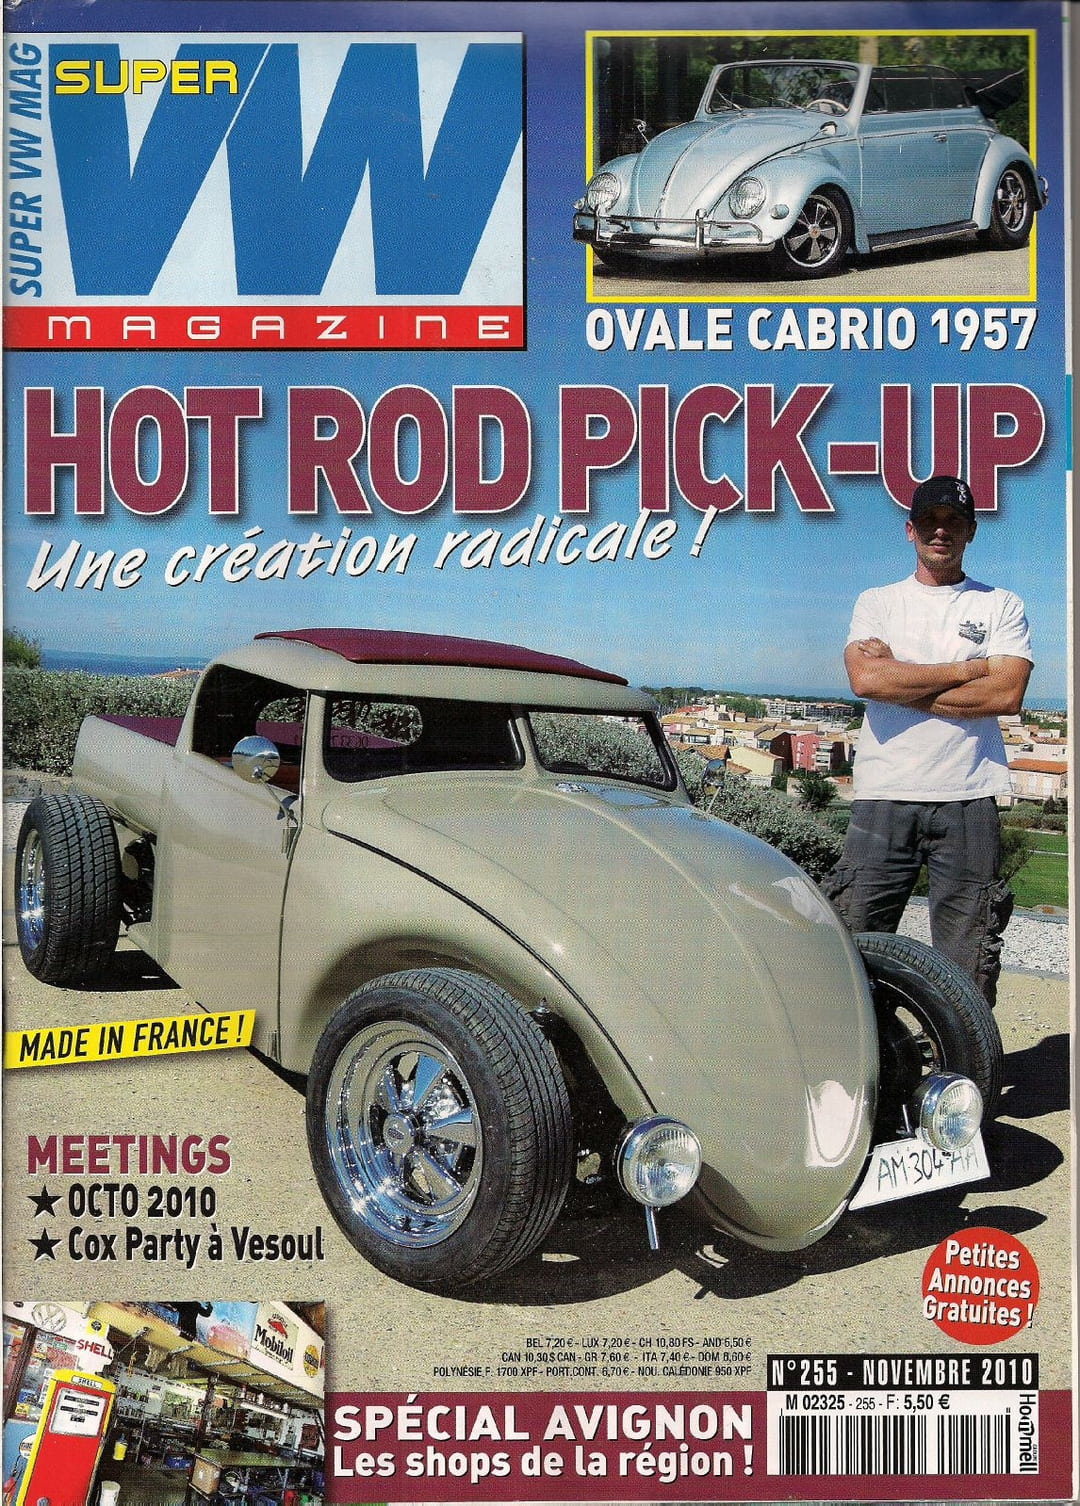 super vw magazine n 255 hot rod pick up ovale cabrio 1957 novembre 2010 ebay. Black Bedroom Furniture Sets. Home Design Ideas